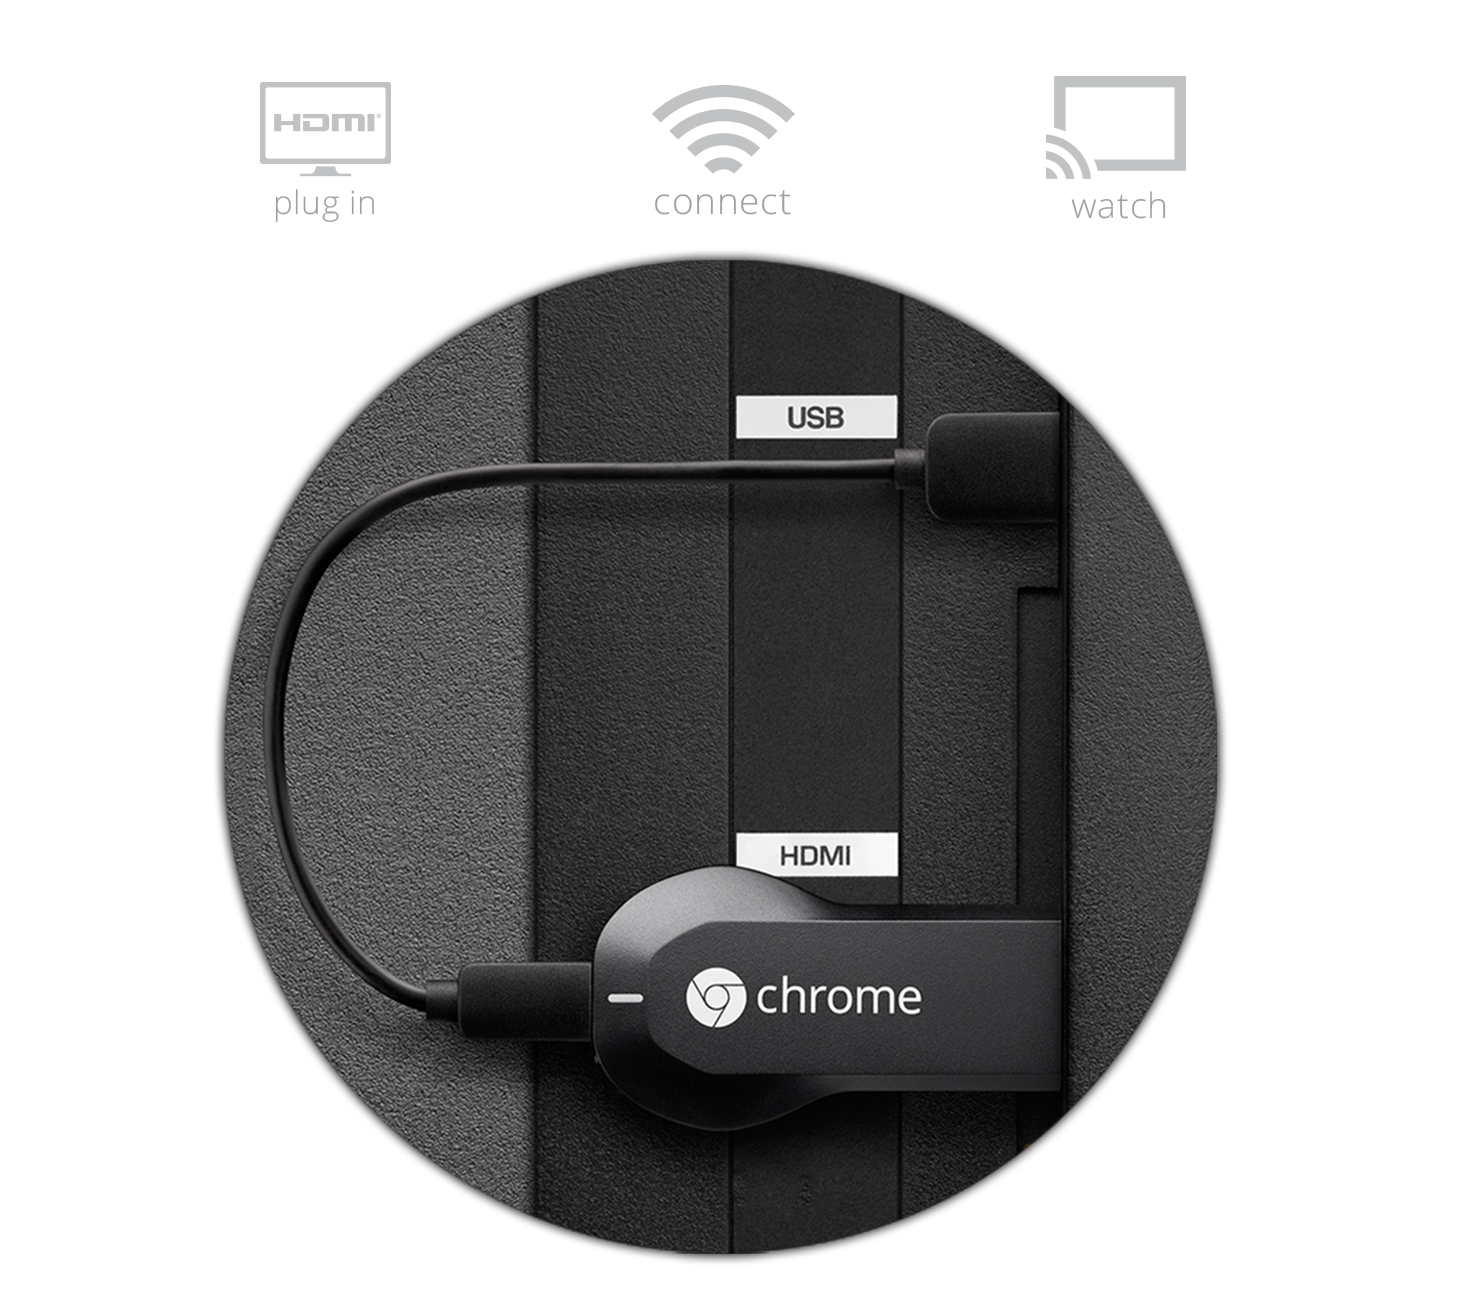 Chromecast_C3_withplug._V378169025_